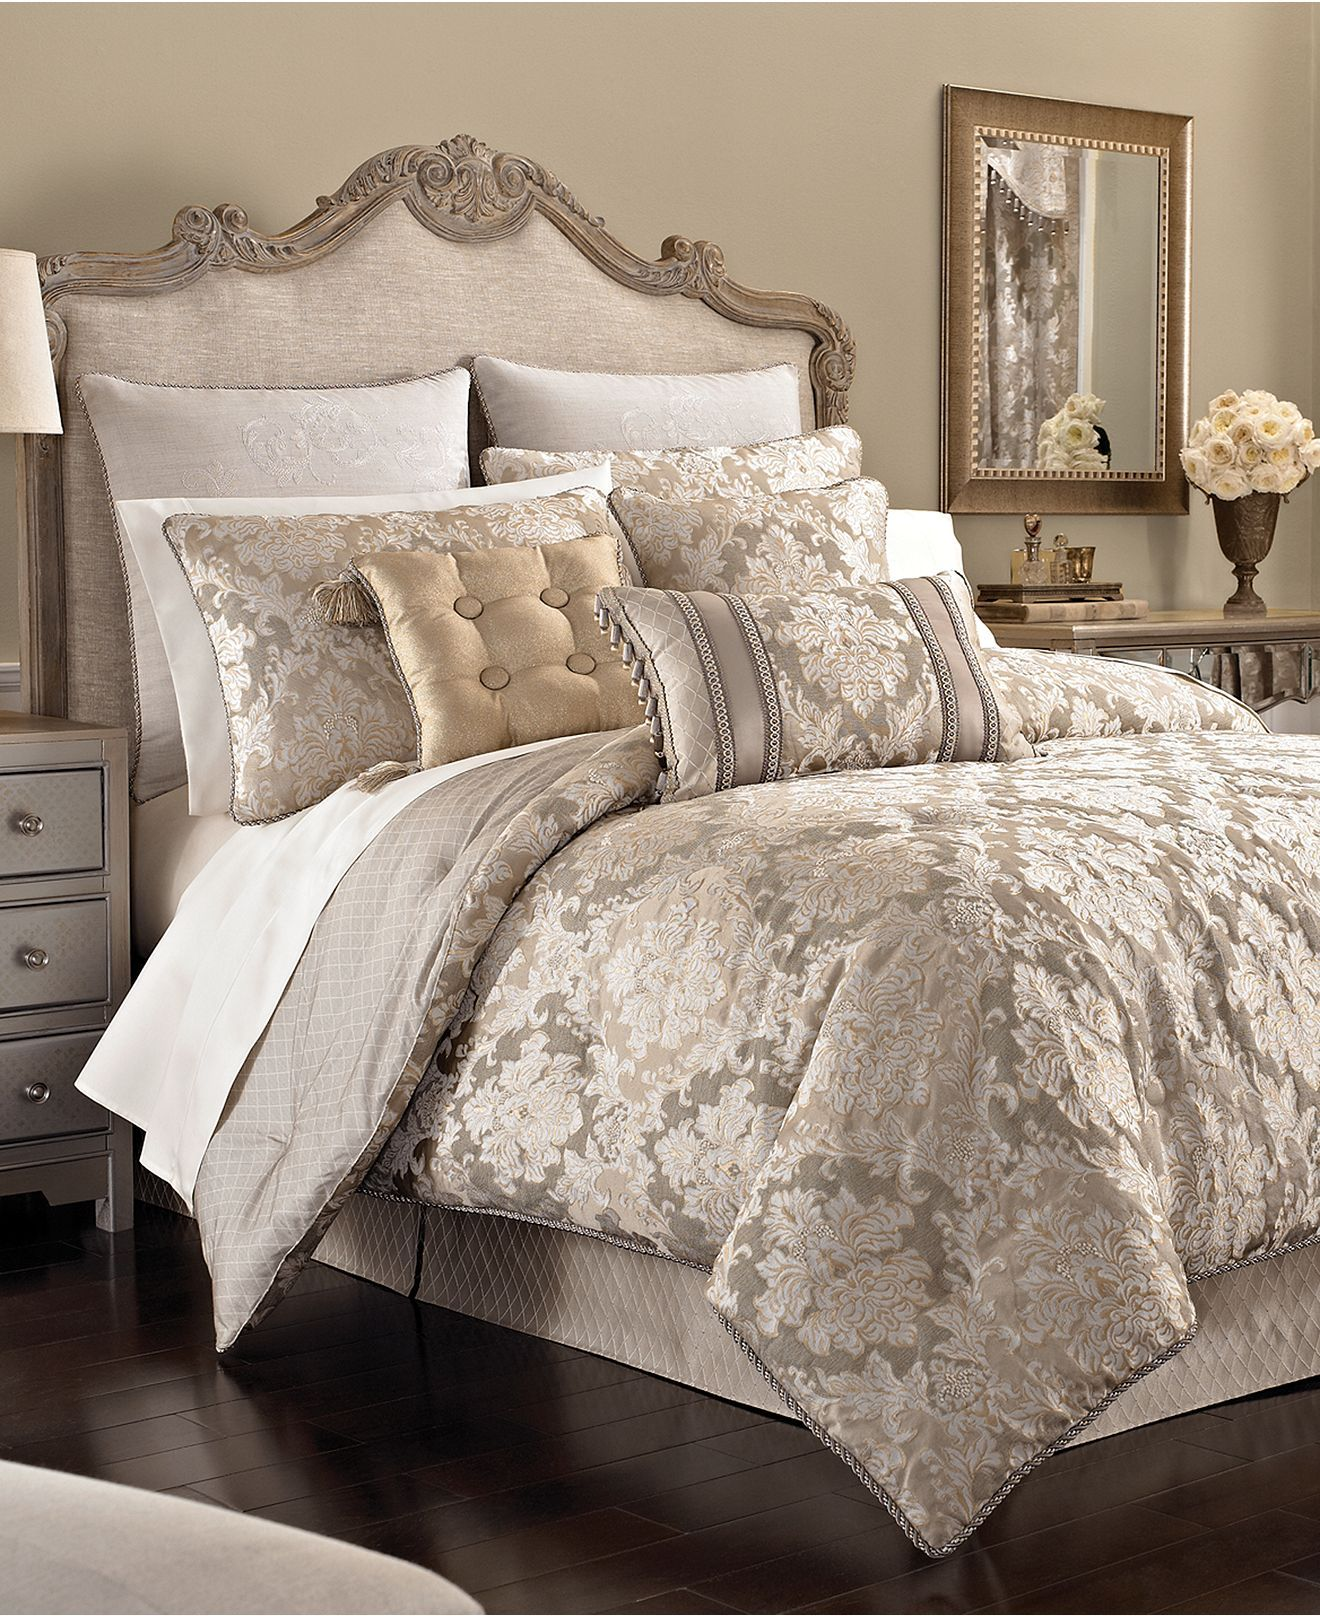 Croscill Bedding, Ava Comforter Sets - Bedding Collections ...